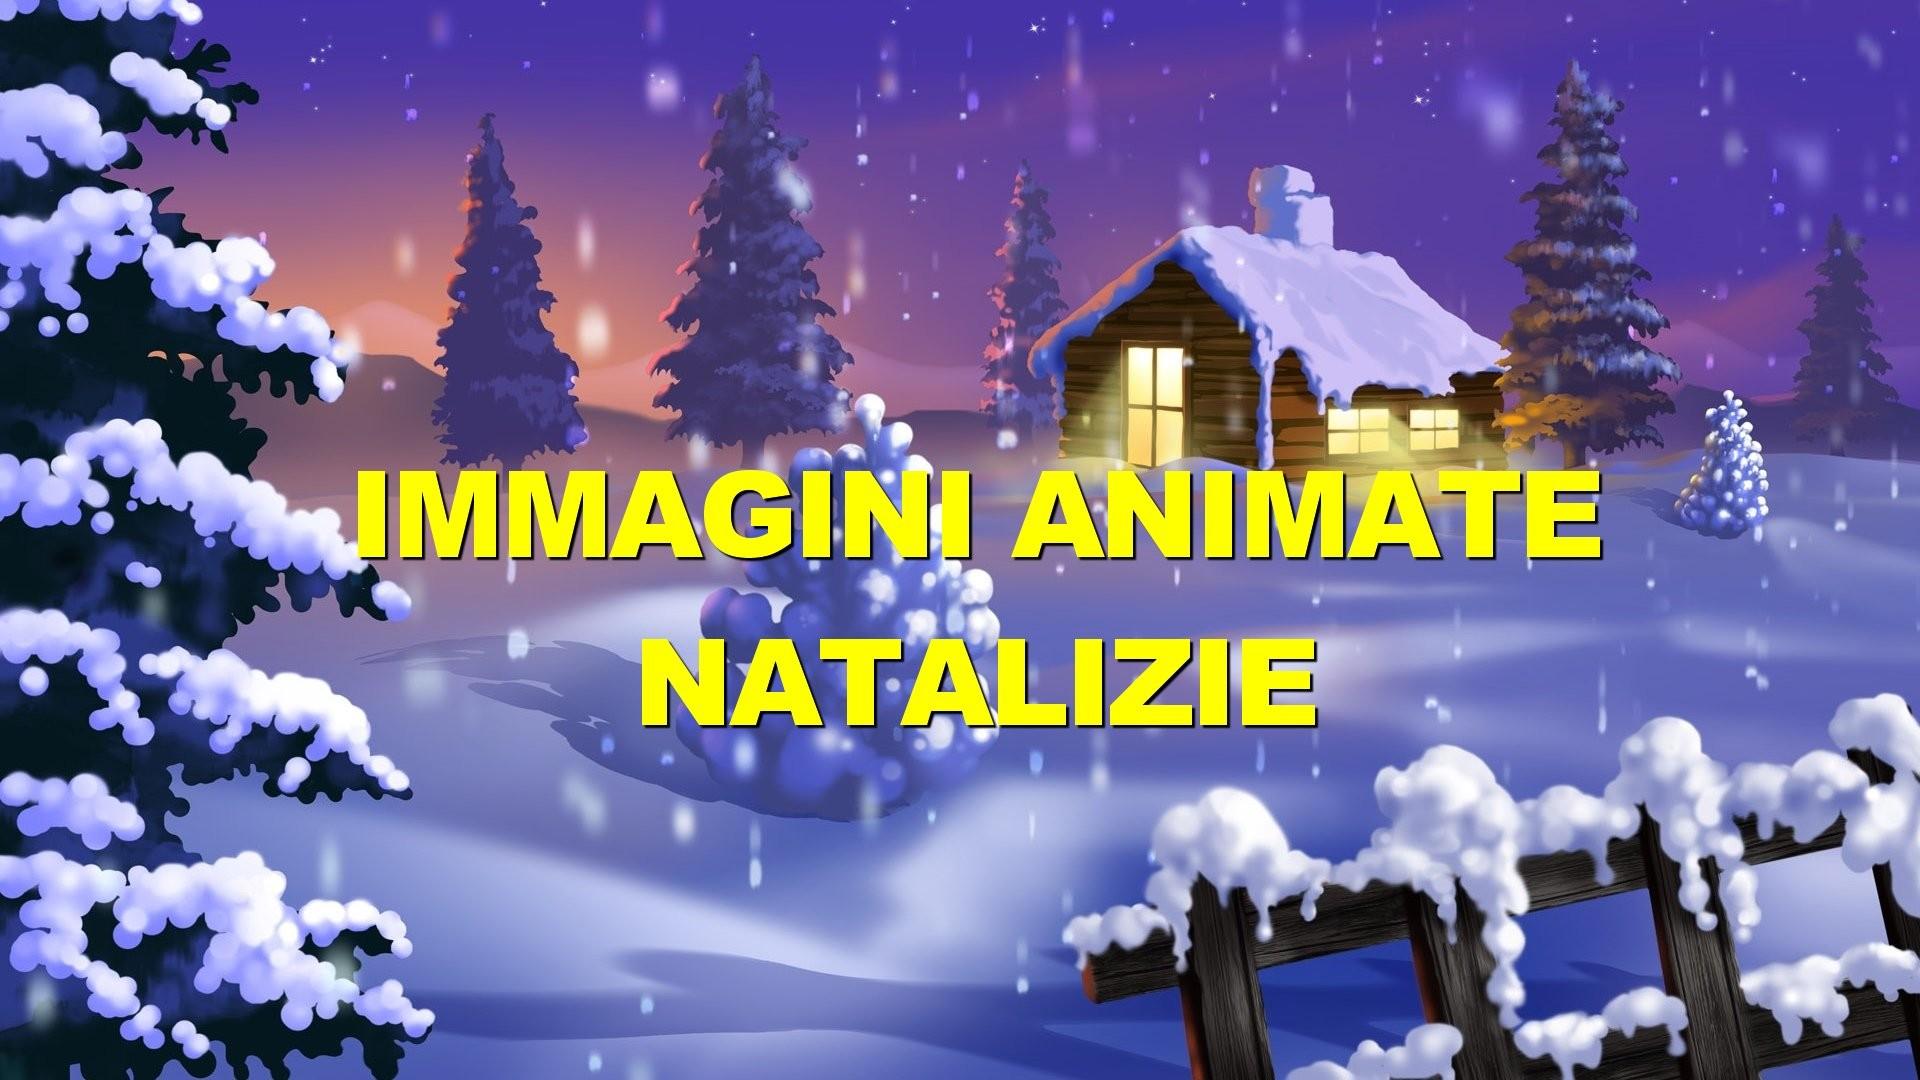 Sfondi Natalizi Gratis Animati.Sfondi Allegri 46 Immagini